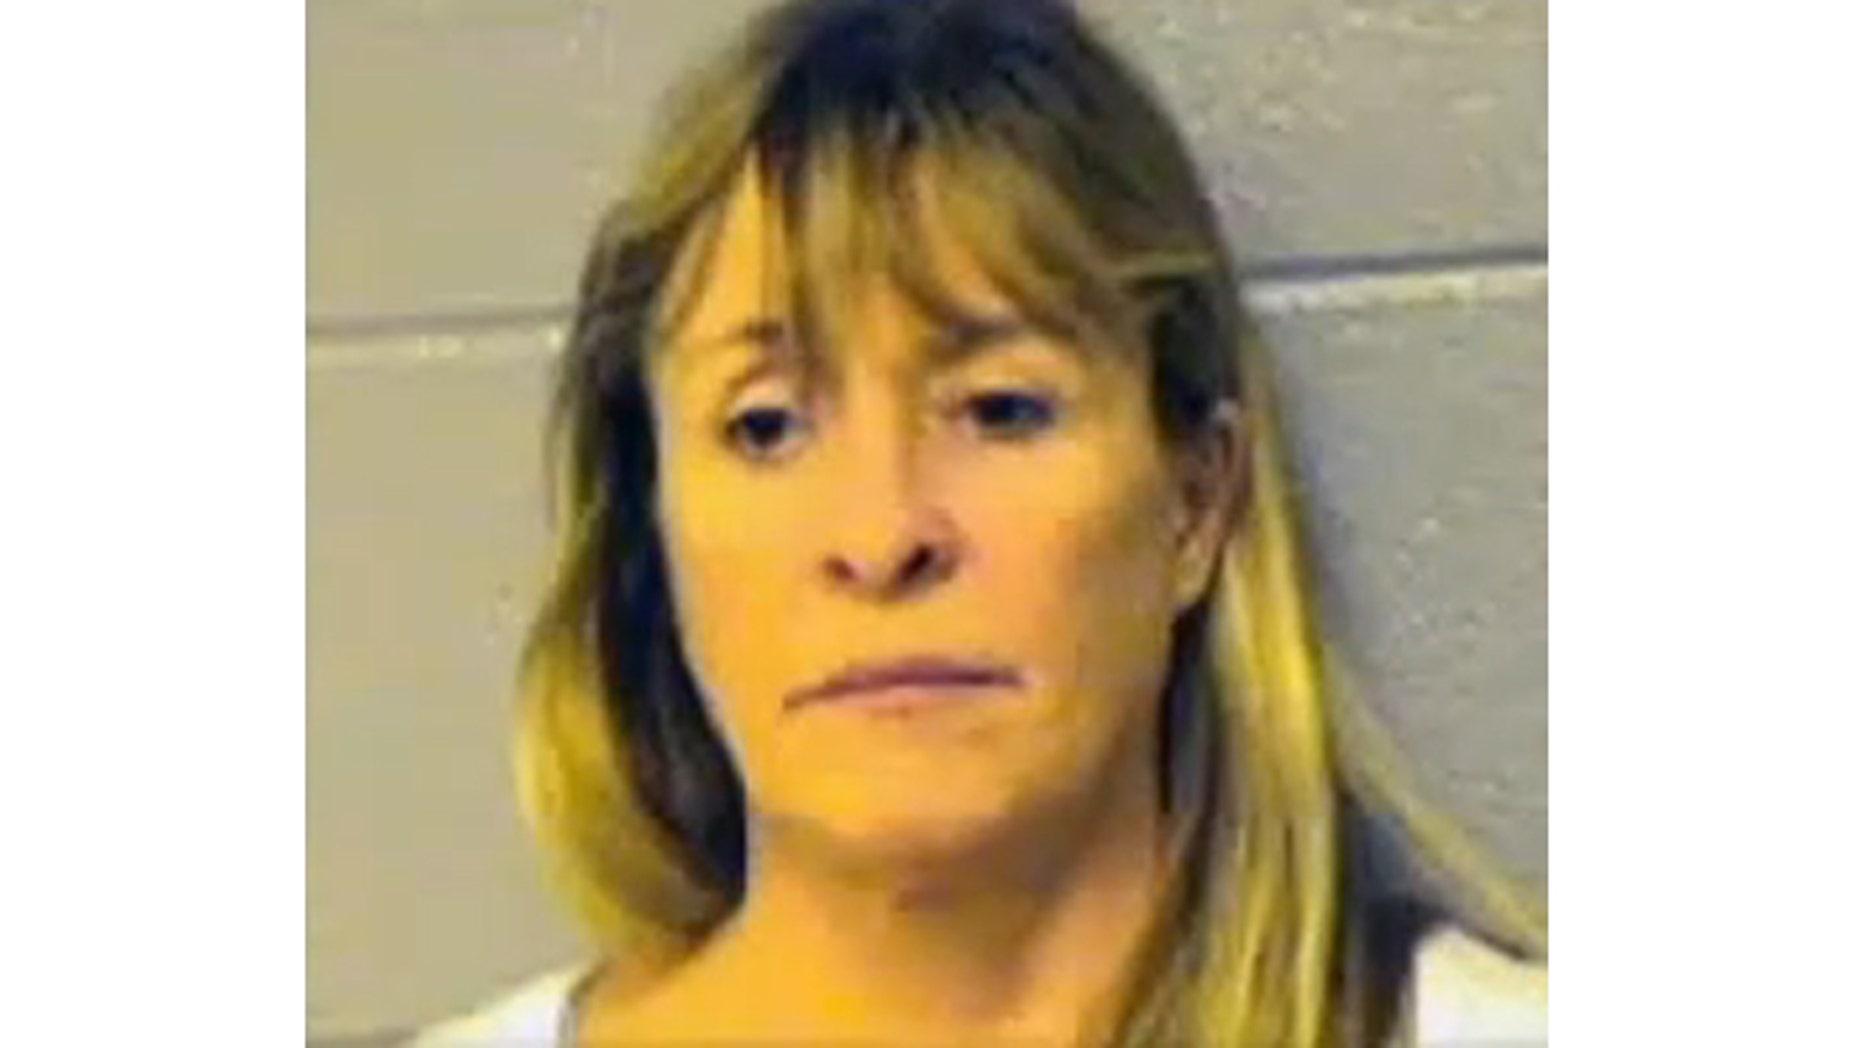 Elaine Cook allegedly bit her boyfriend's tongue off during an argument.